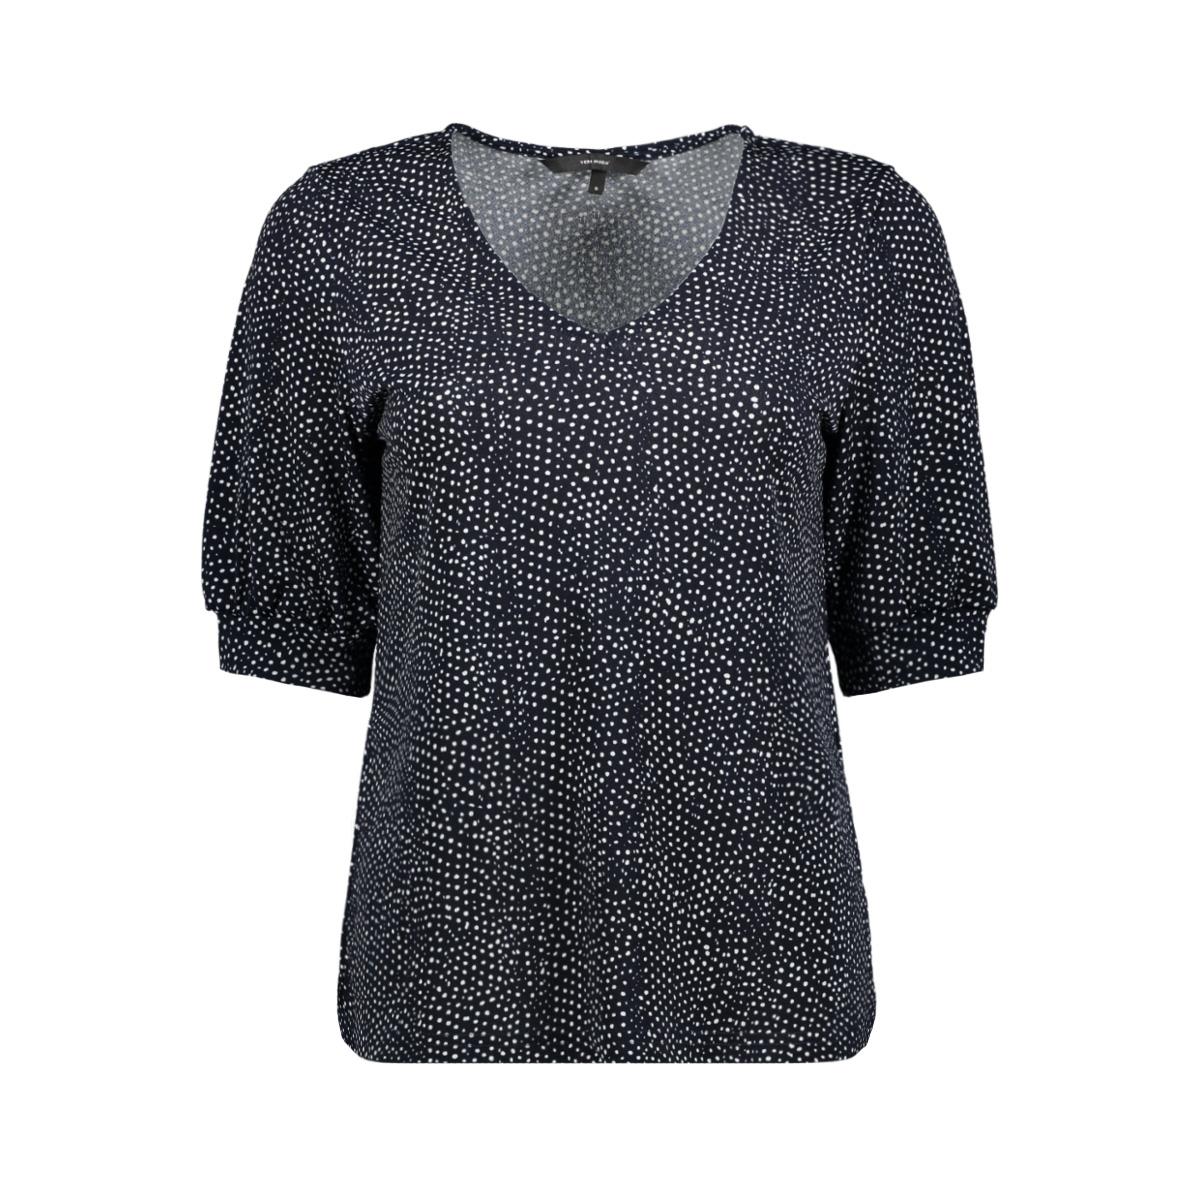 vmtia 2/4 top jrs 10212578 vero moda t-shirt night sky/snow white